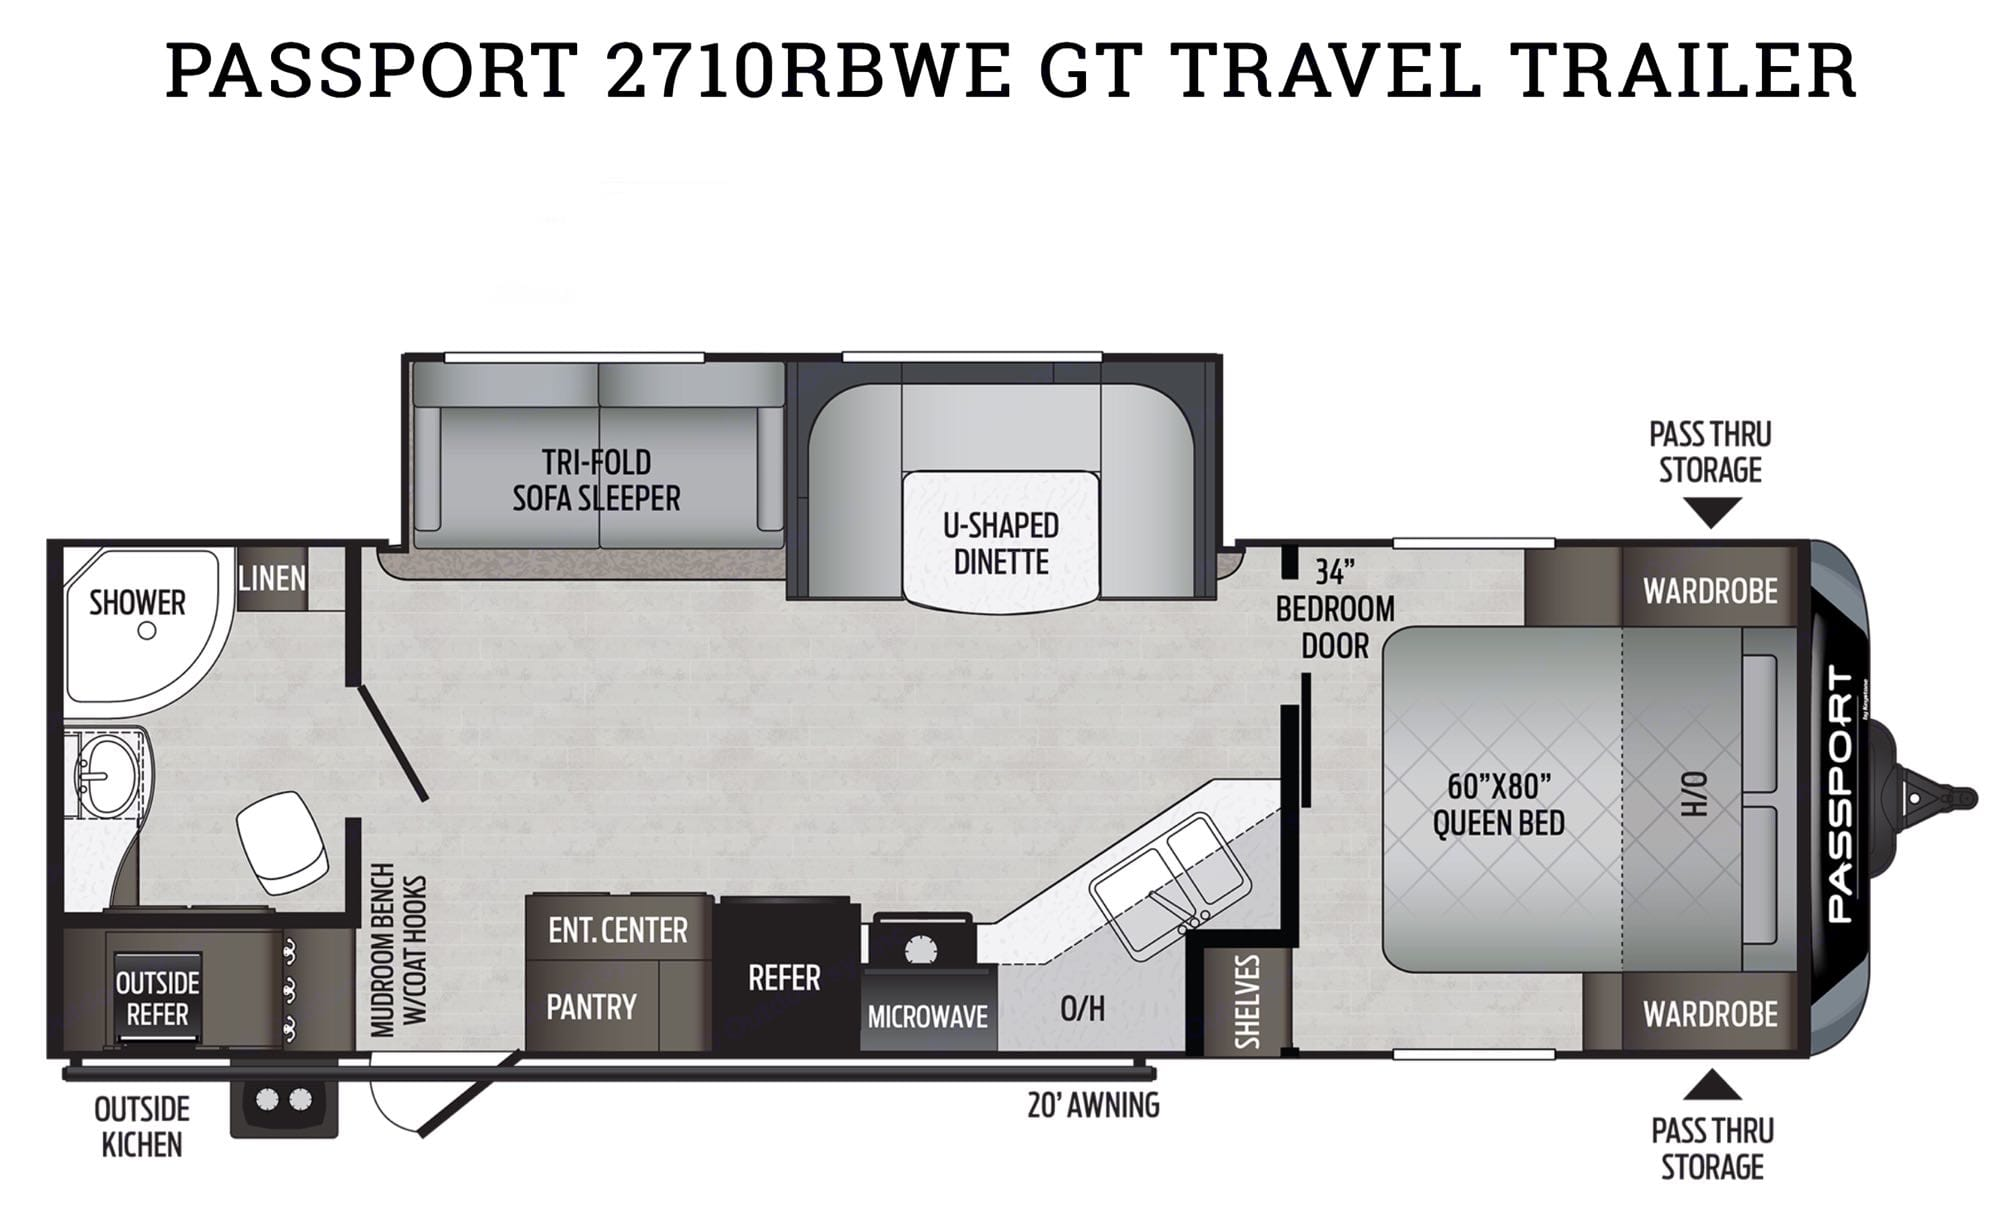 Take a 360º tour of the interior at  https://my.matterport.com/show/?m=bNcS2nfvpZ3. Keystone Passport, 2710RBWE GT Series 2020